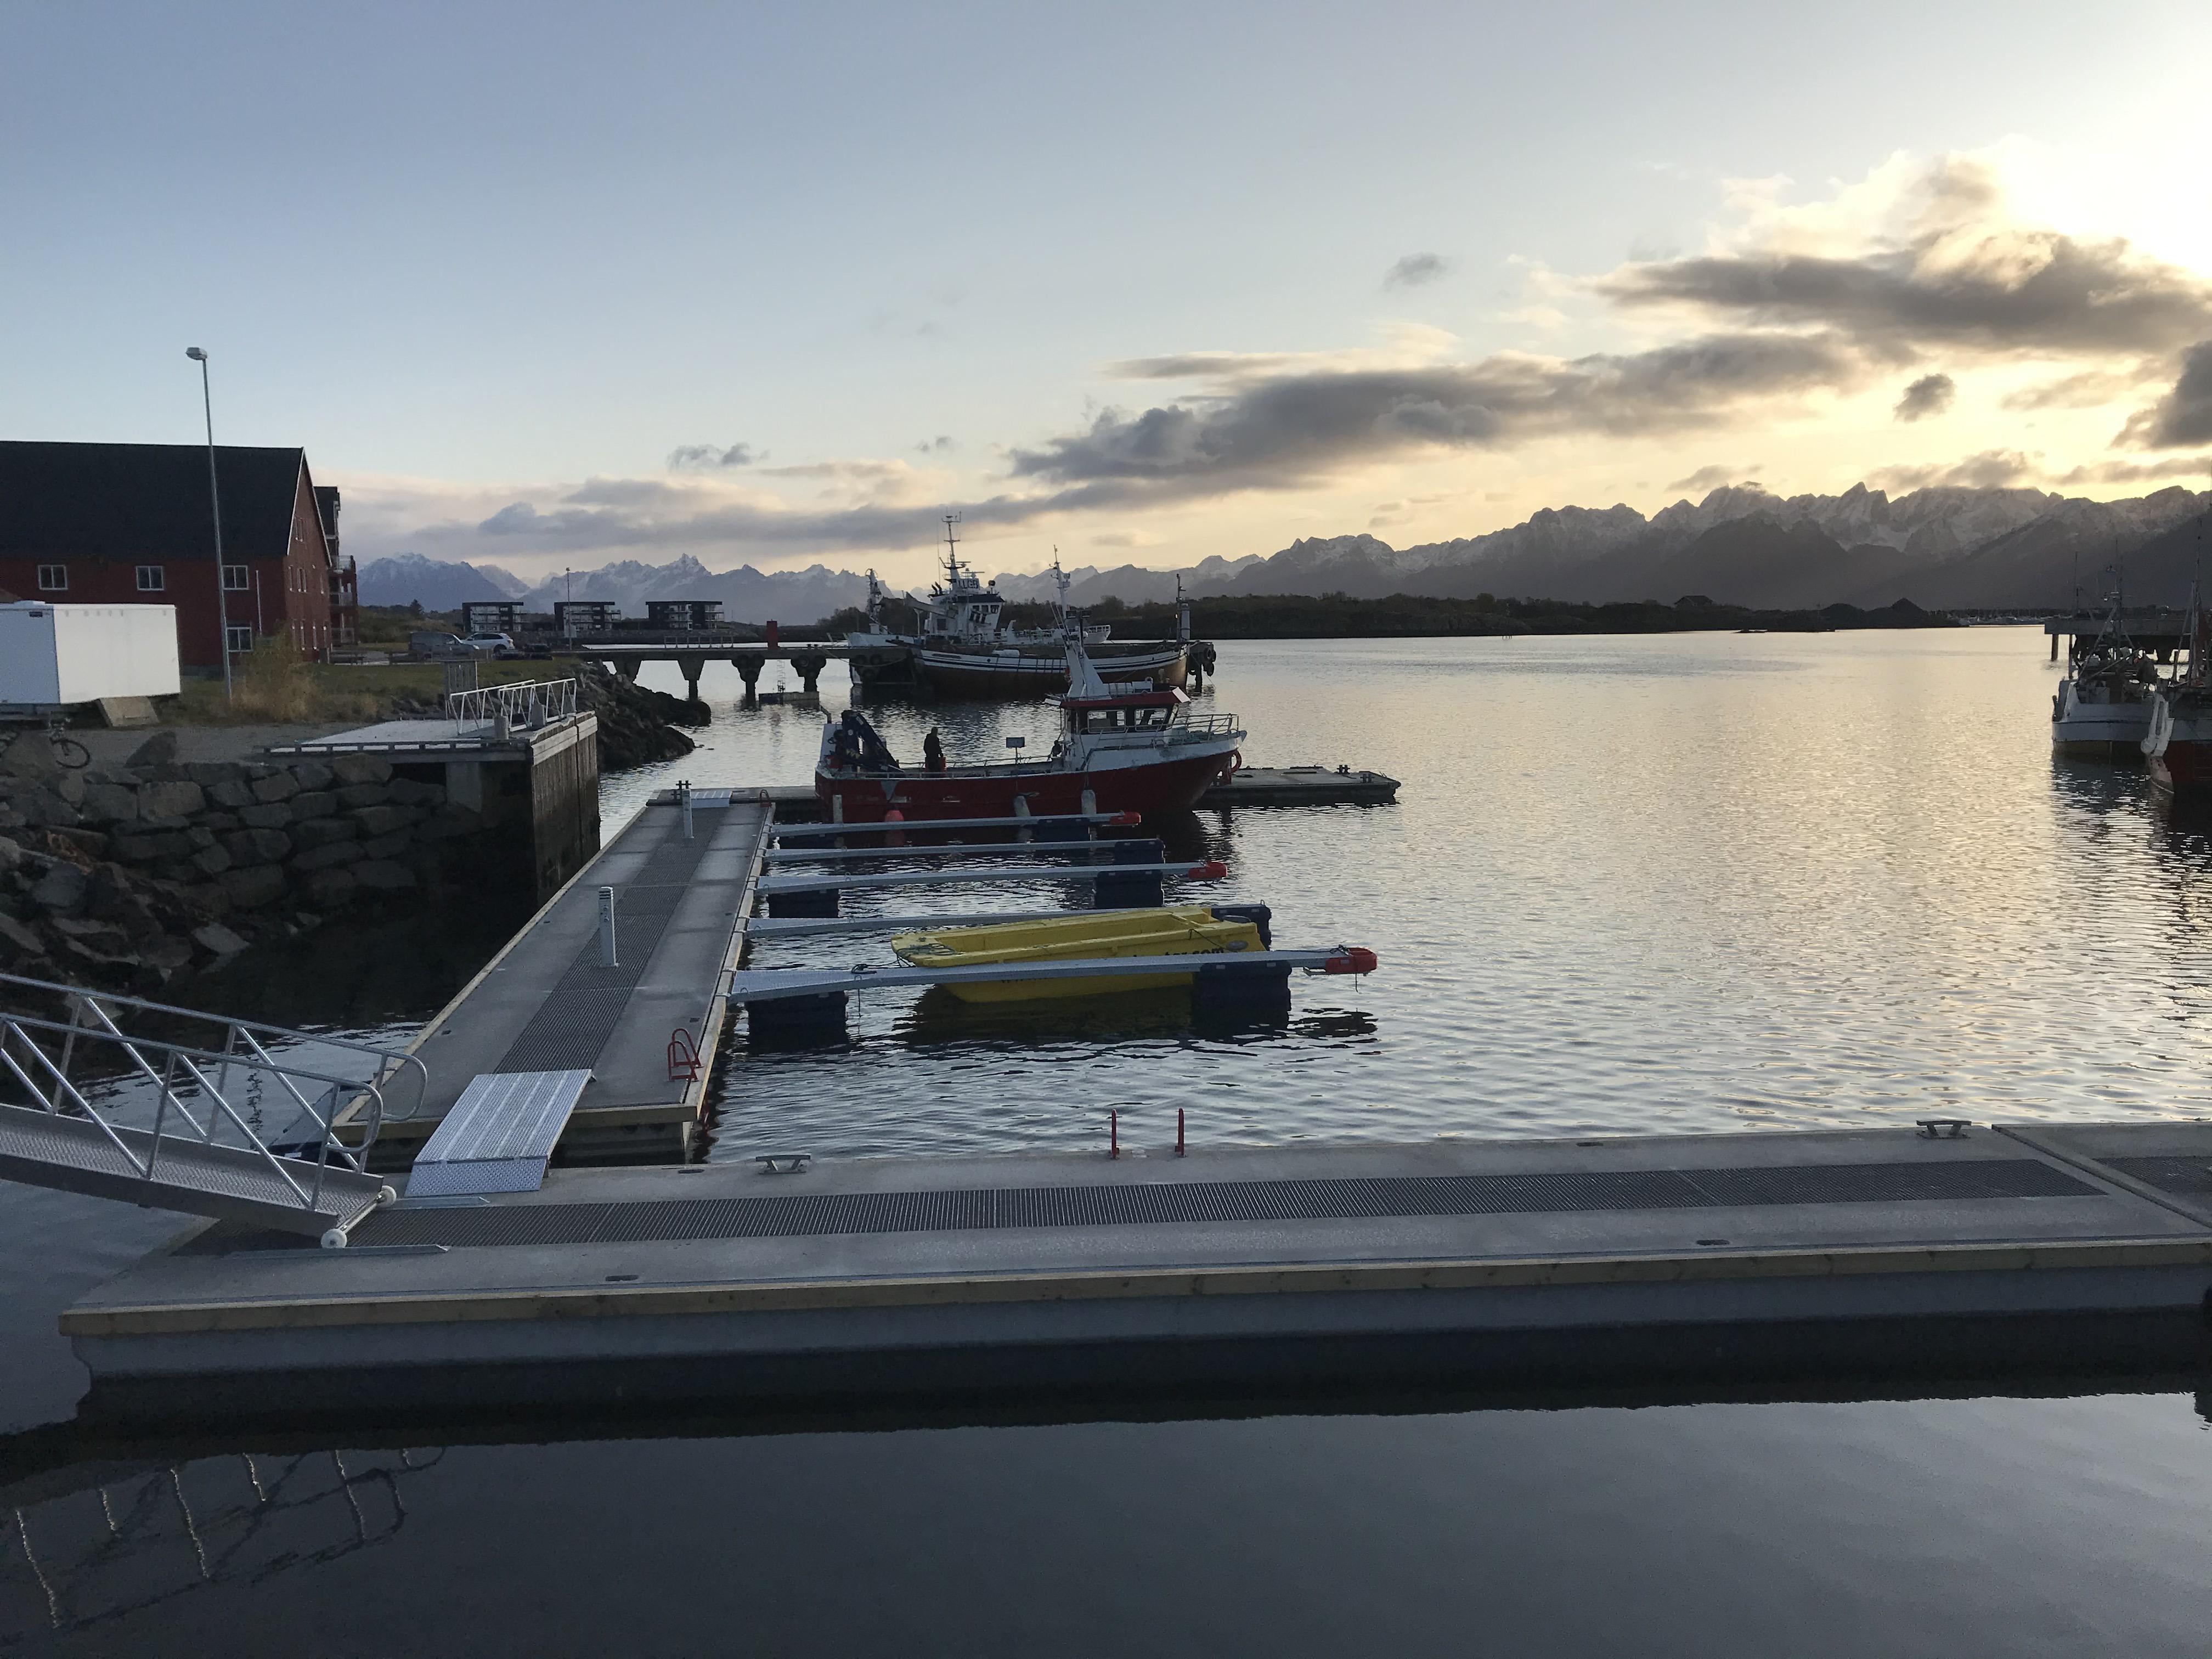 https://www.marinasolutions.no/uploads/Hadsel-havn-melbu-snøfrie-betongbrygger-marina-solutions-Tallykey-strømposter.jpg